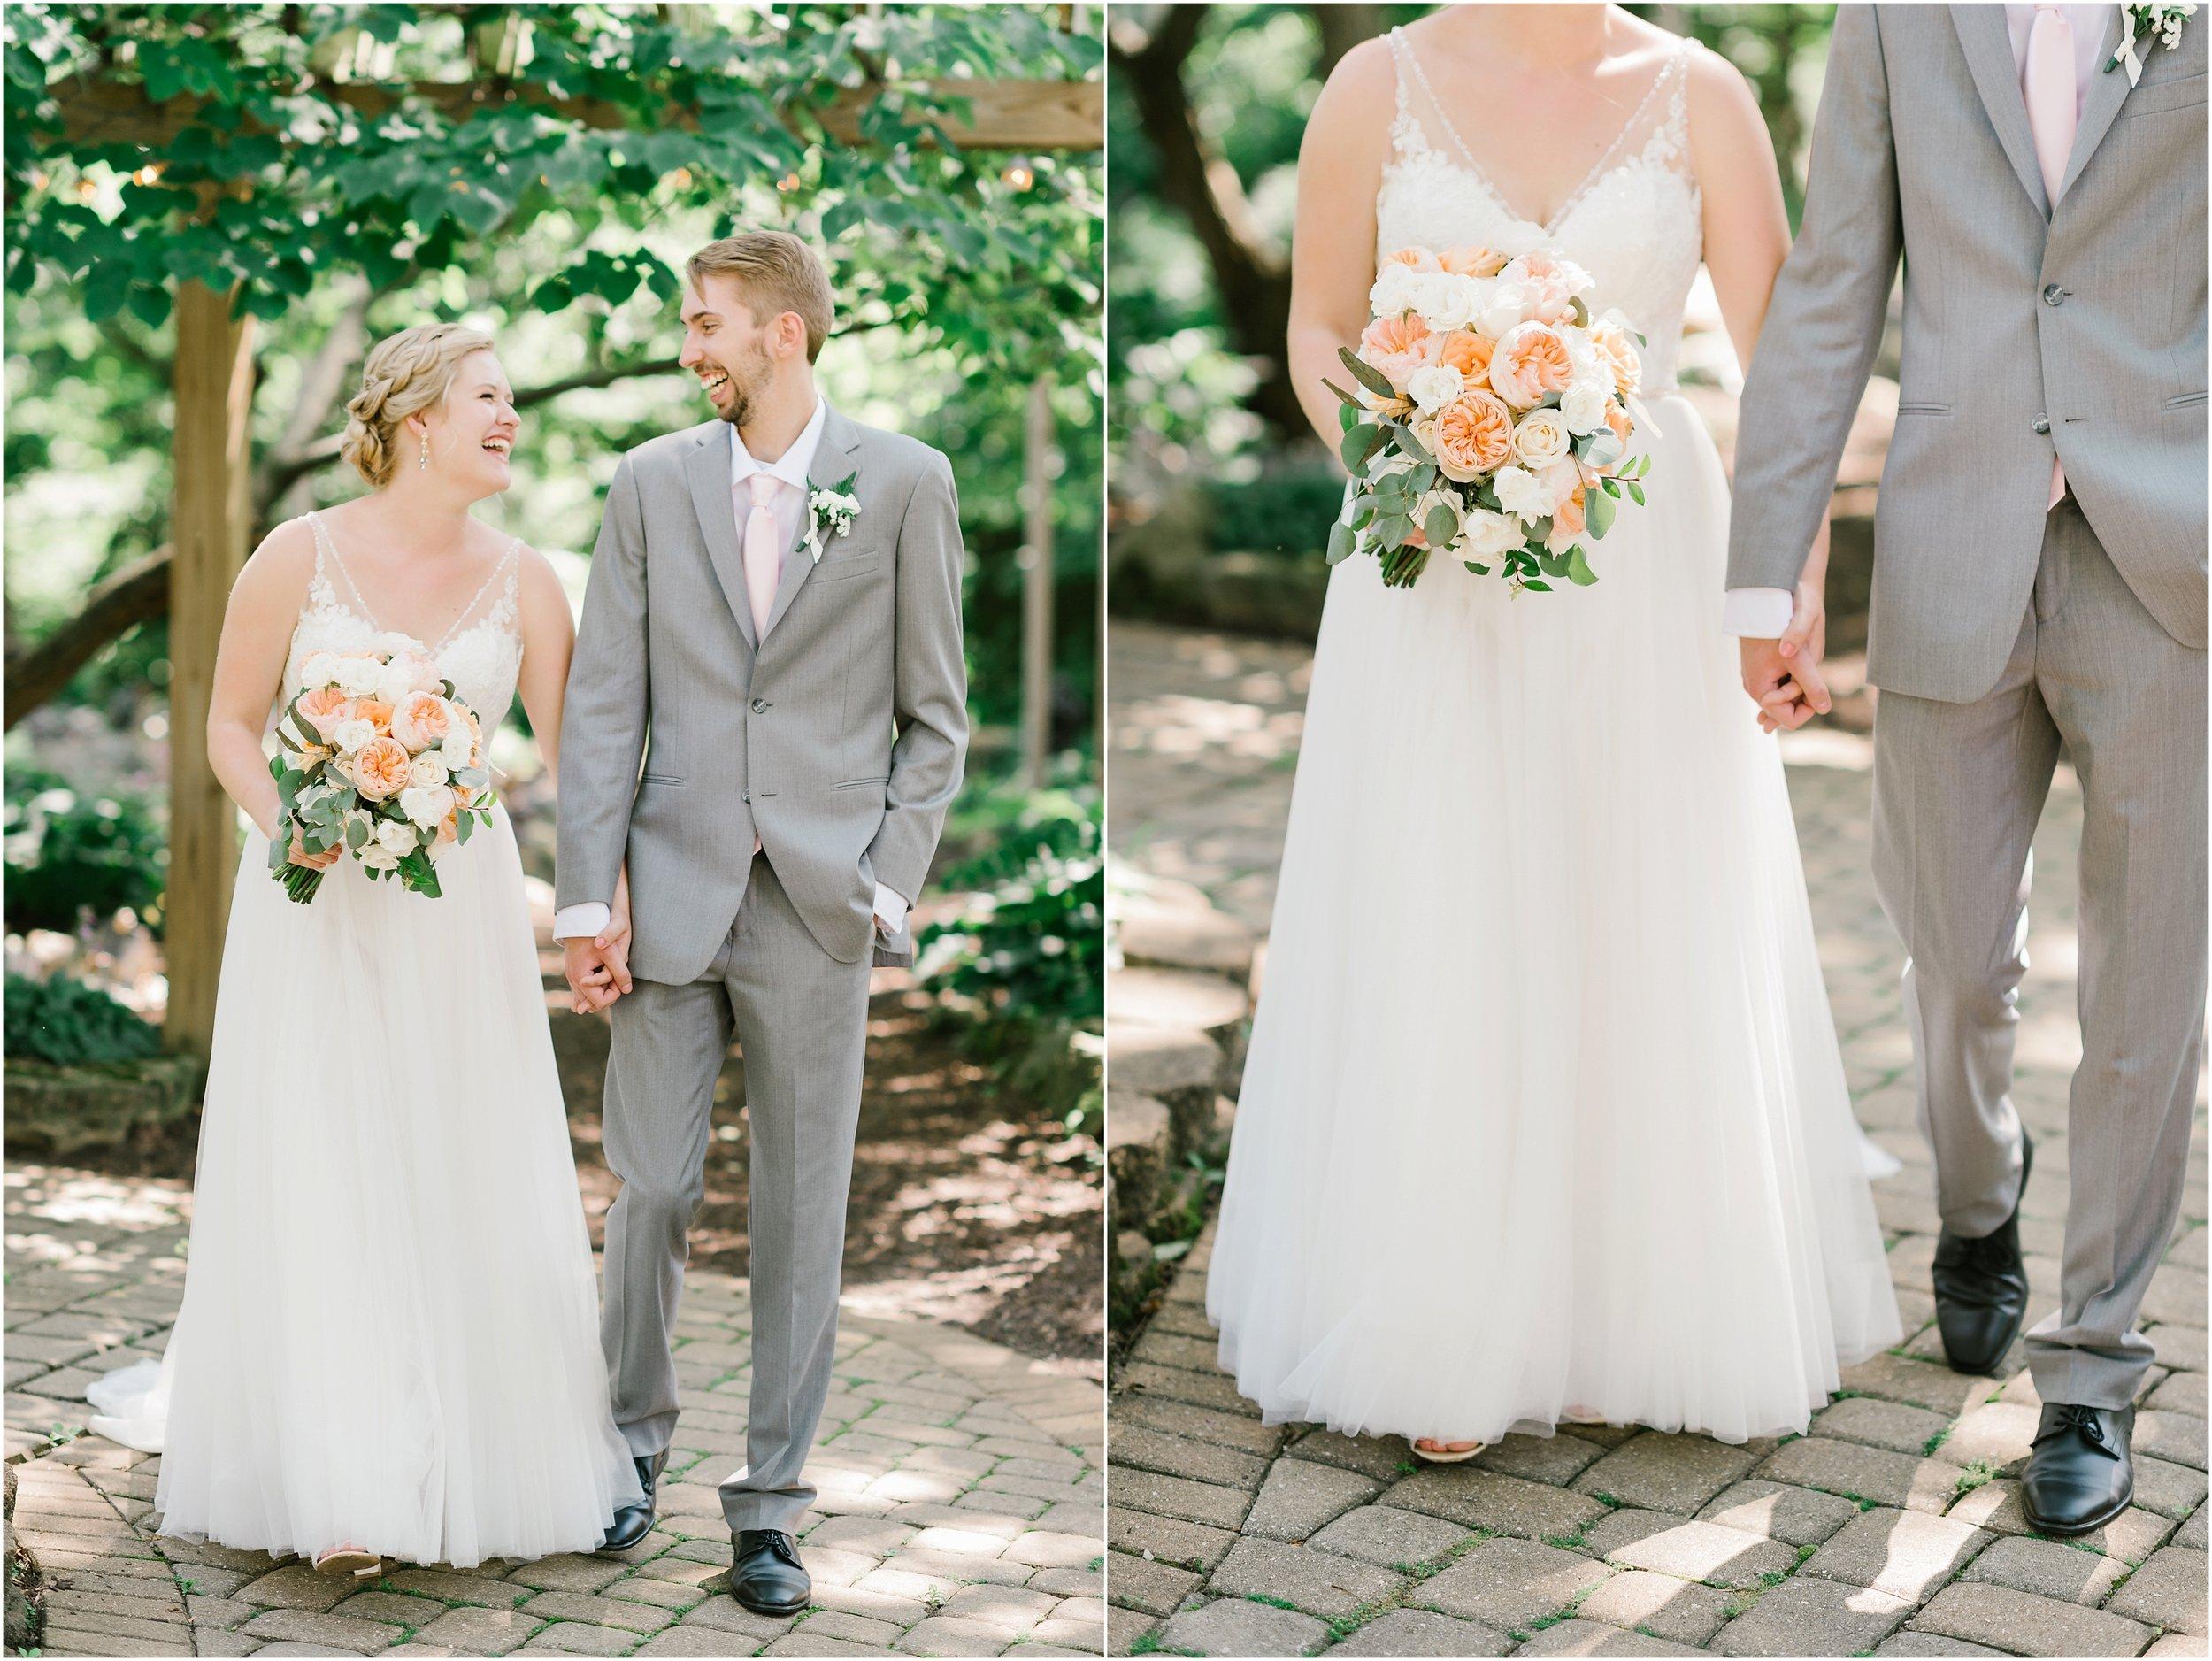 Rebecca_Shehorn_Photography_Indianapolis_Wedding_Photographer_8493.jpg